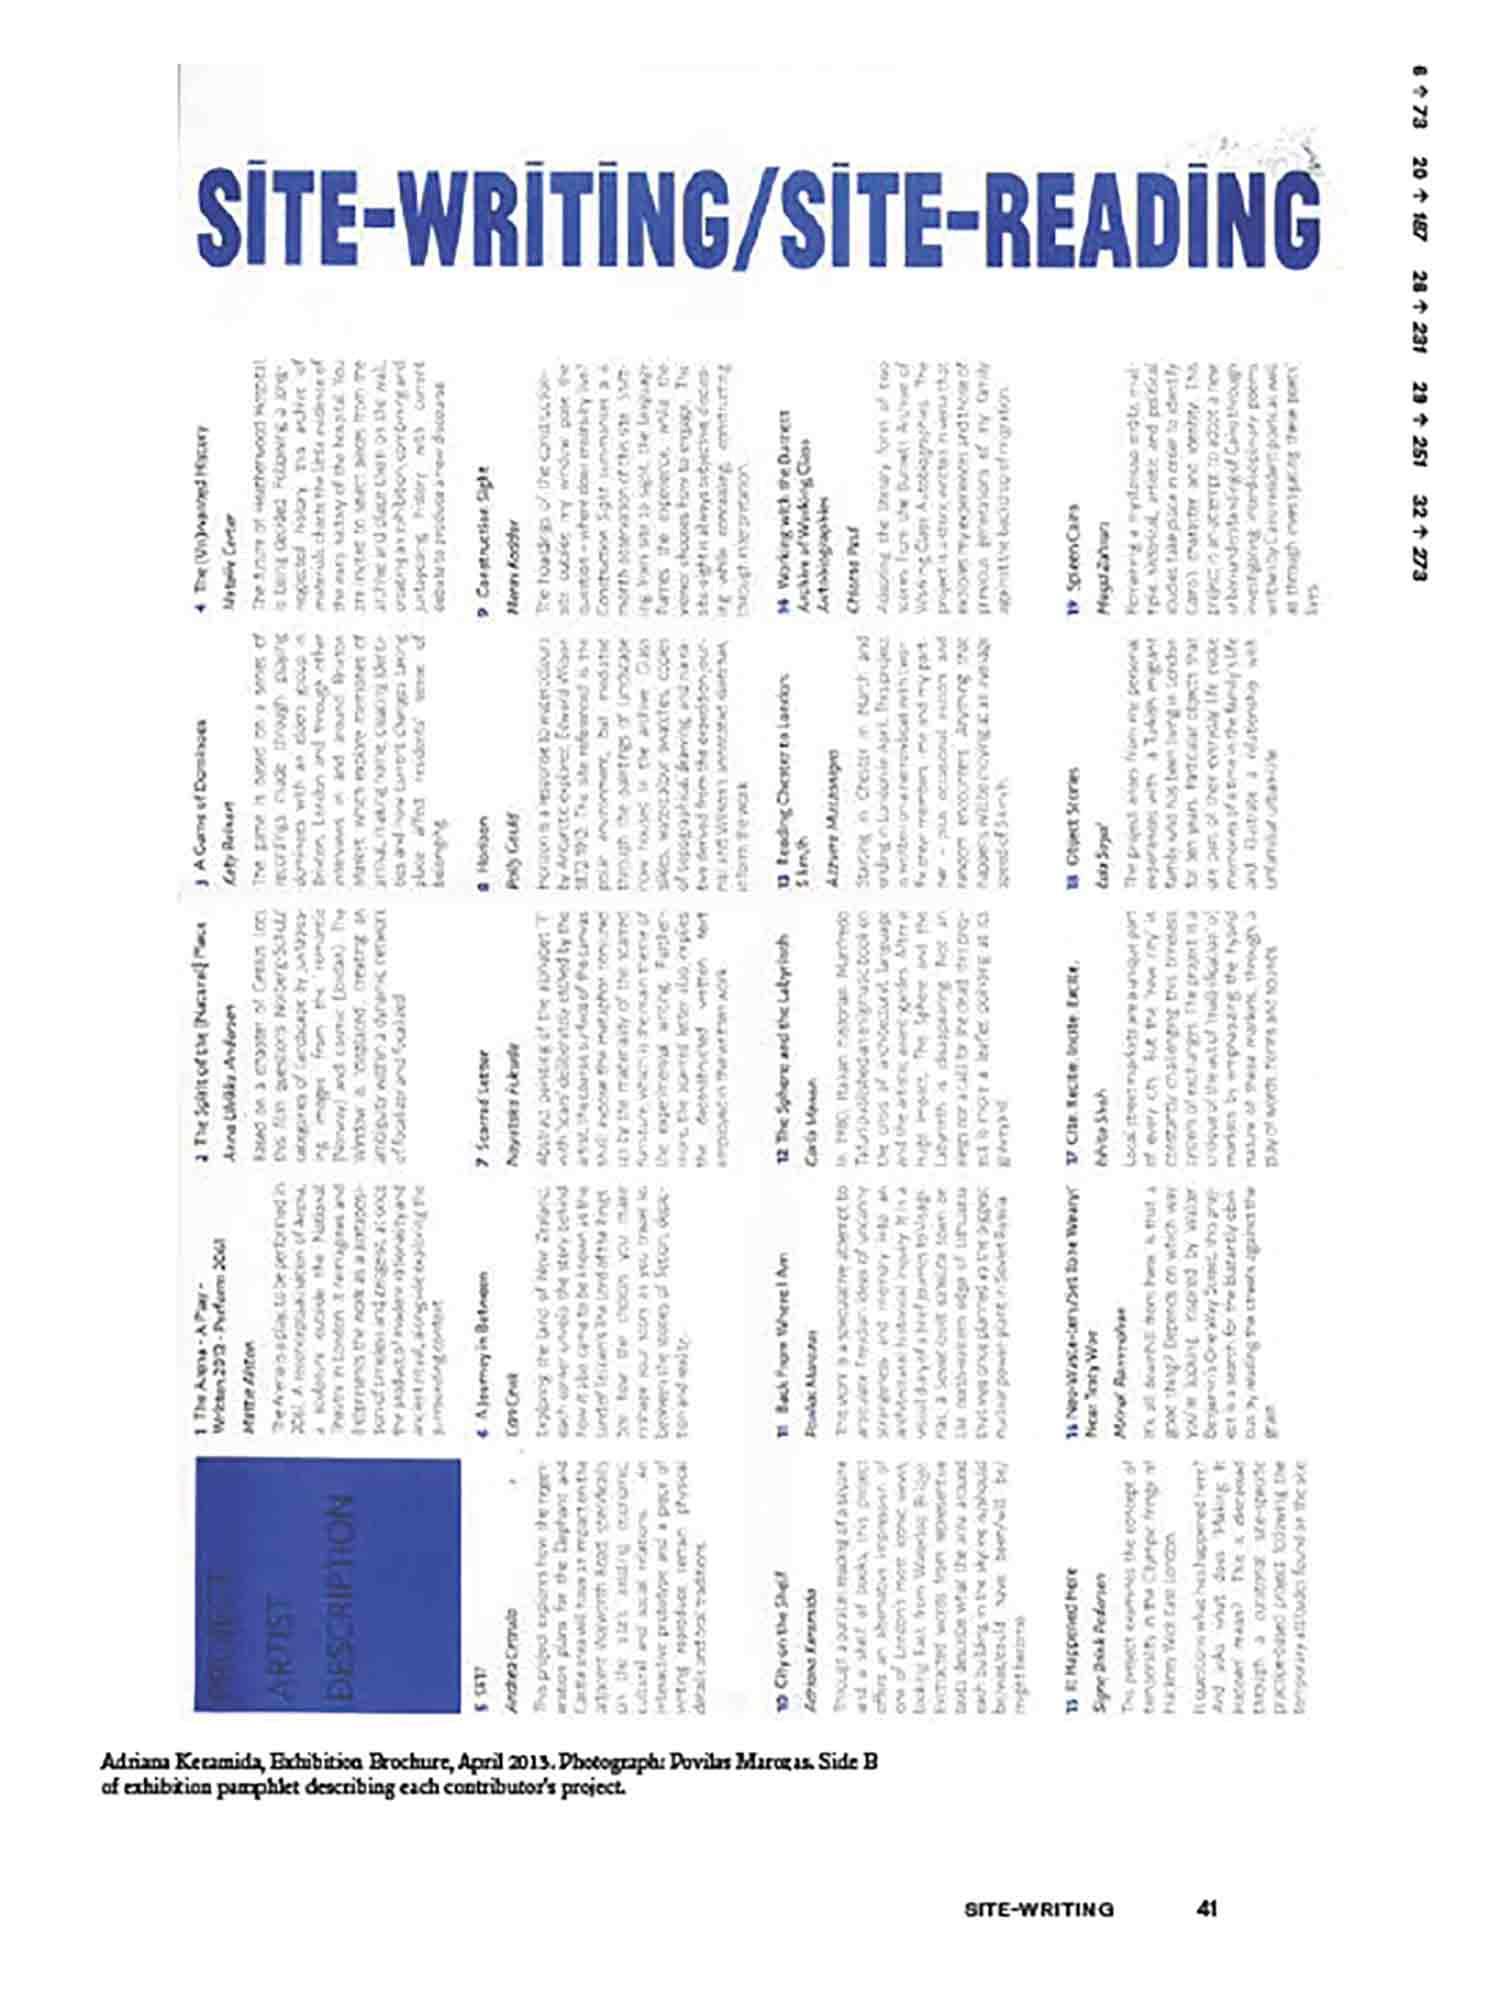 Site-Writing_Site-Reading-Engaged-Urbanism-41